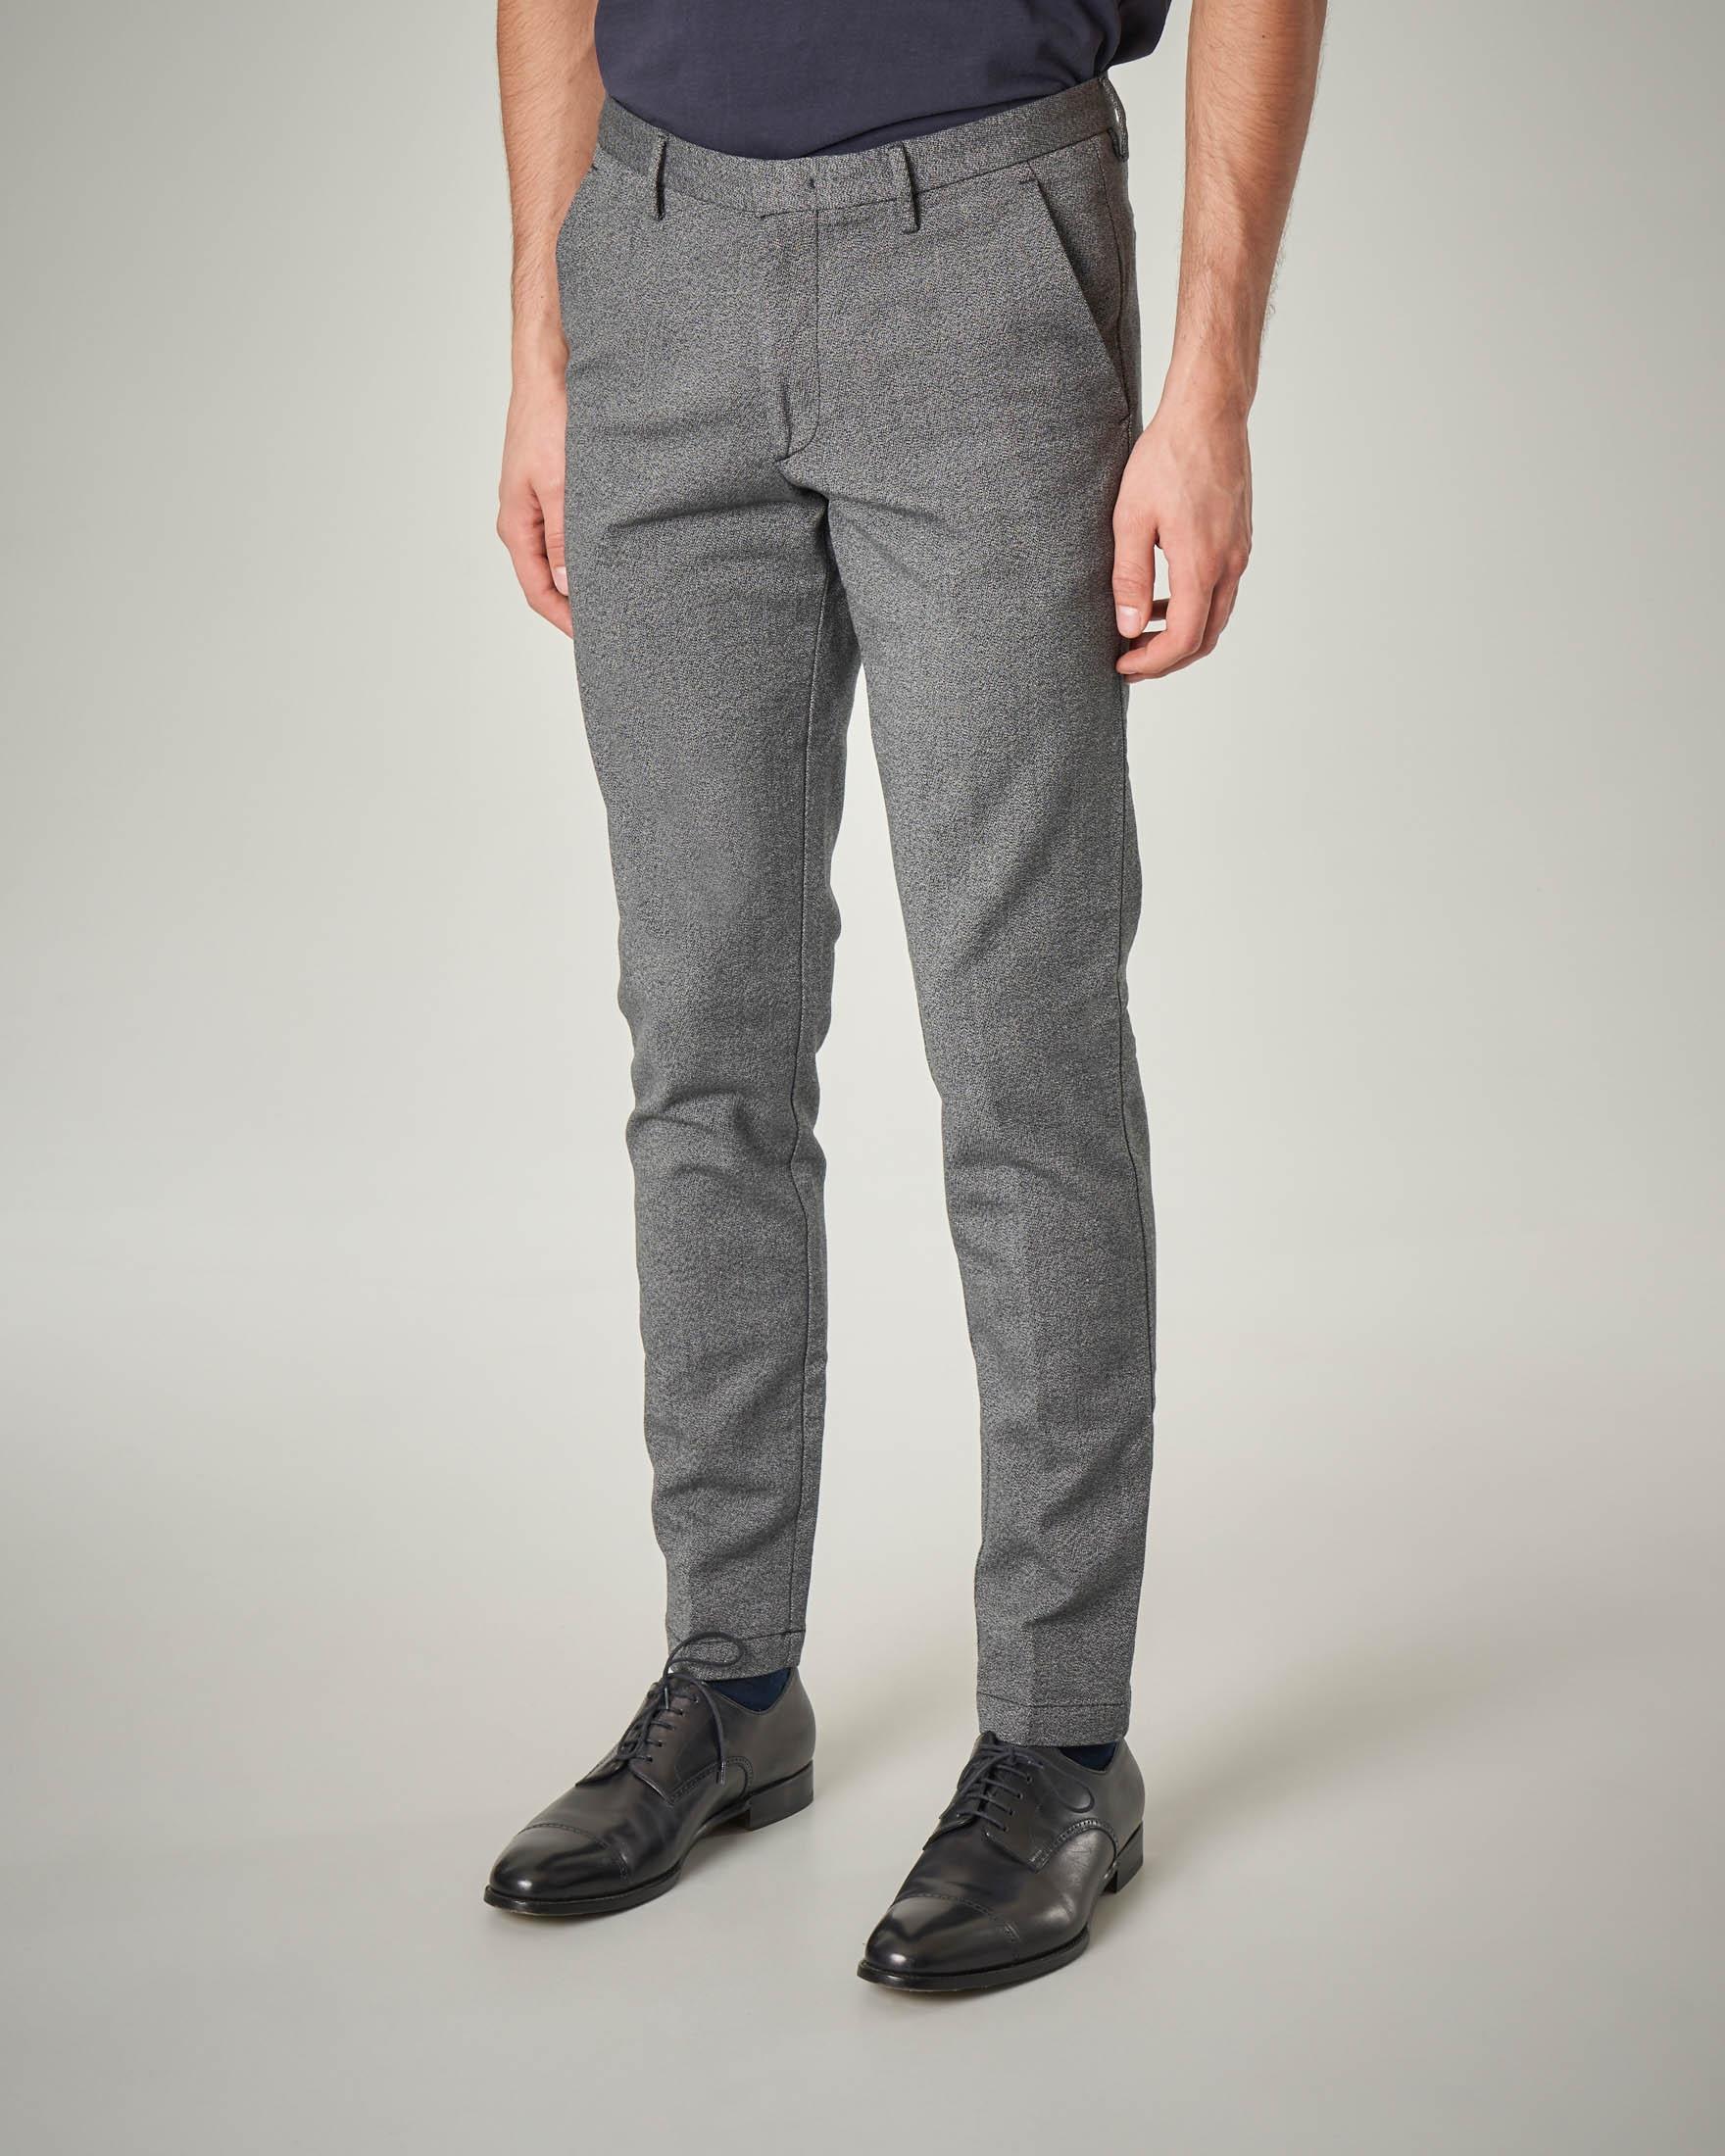 Pantalone grigio tessuto moulinè